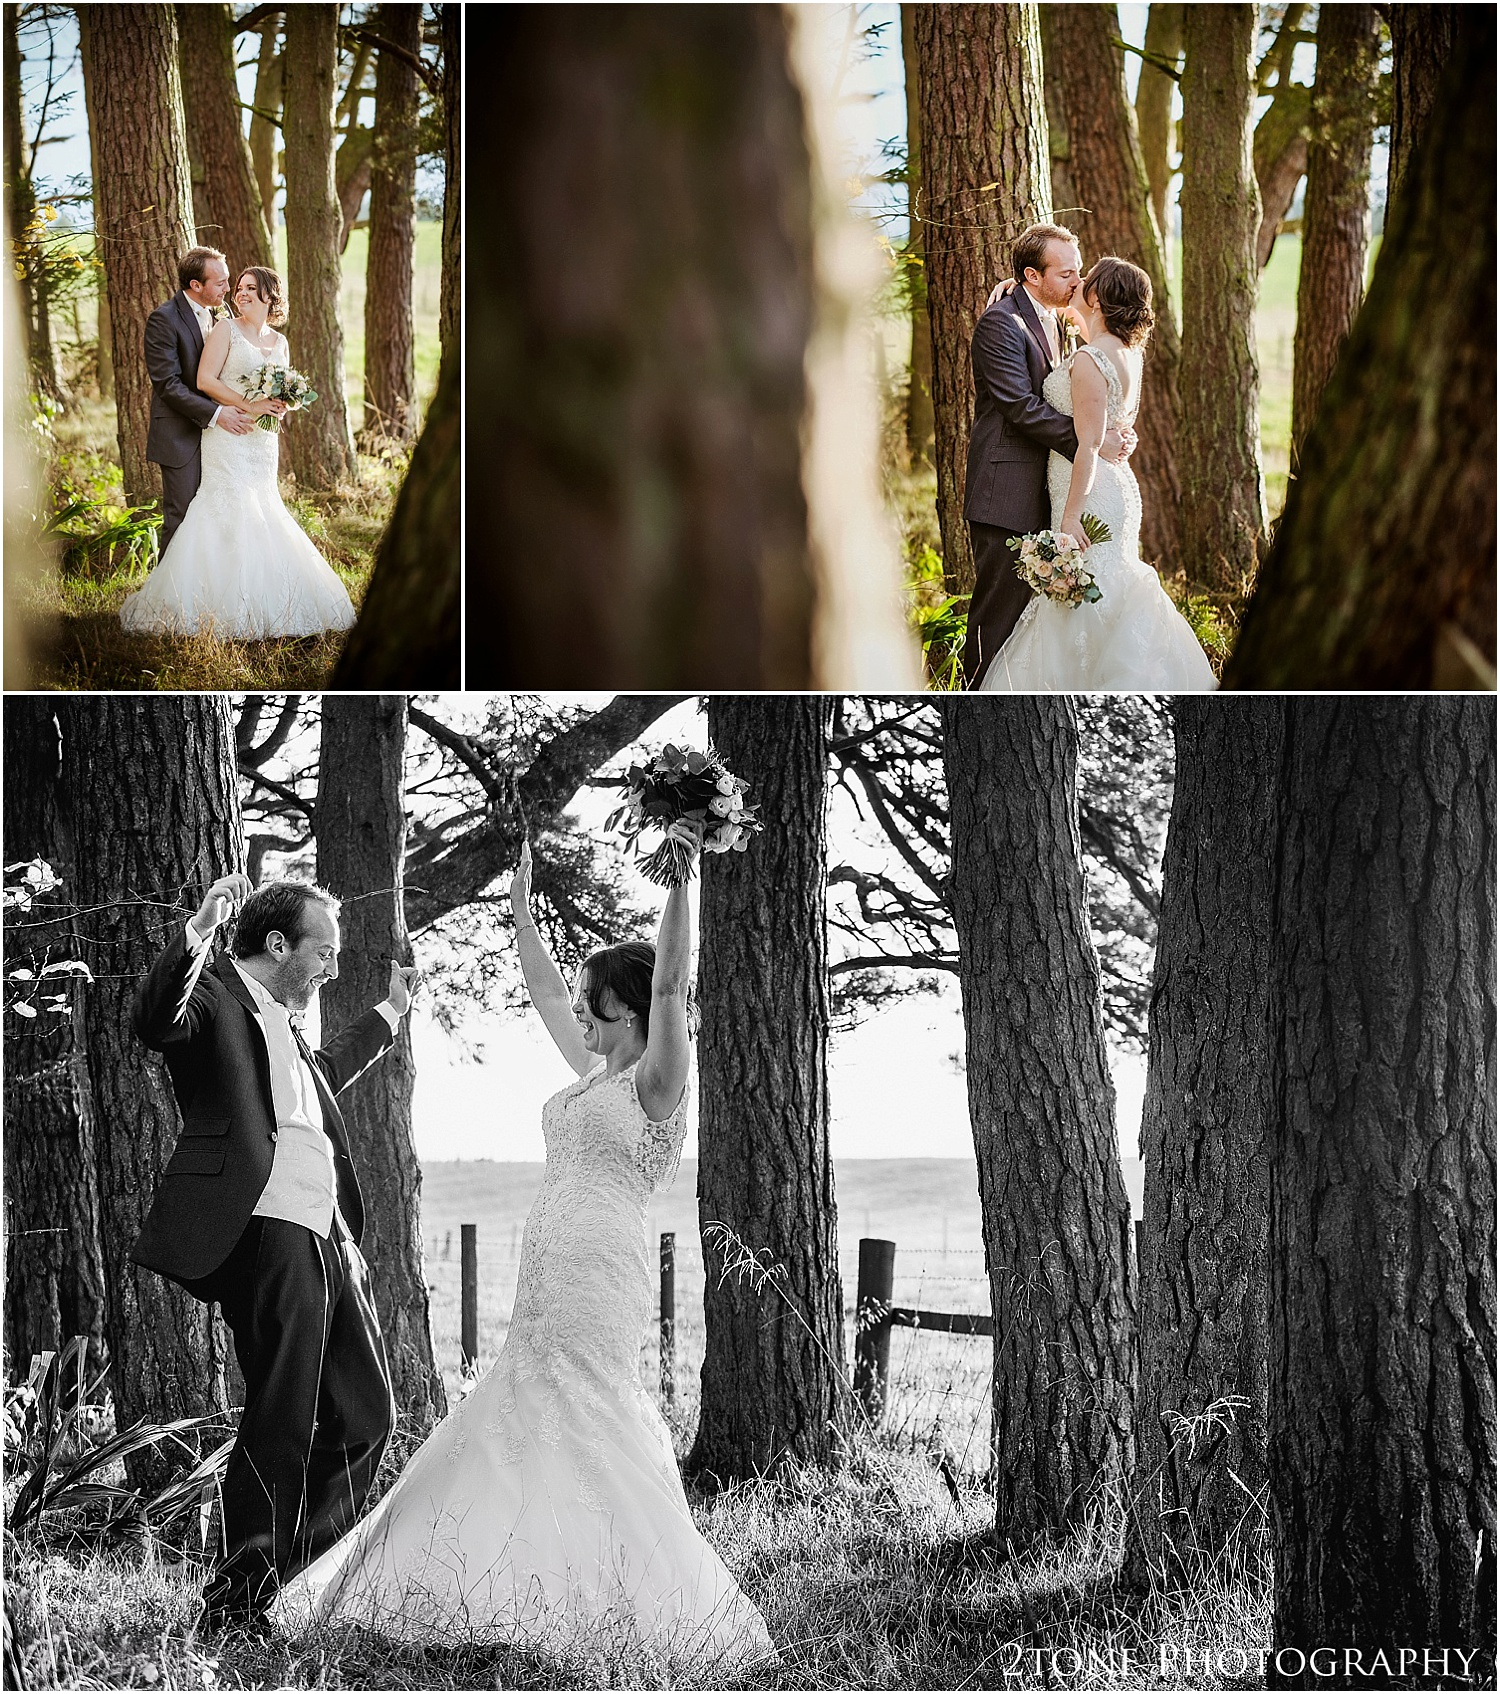 Woodhill Hall wedding 34.jpg